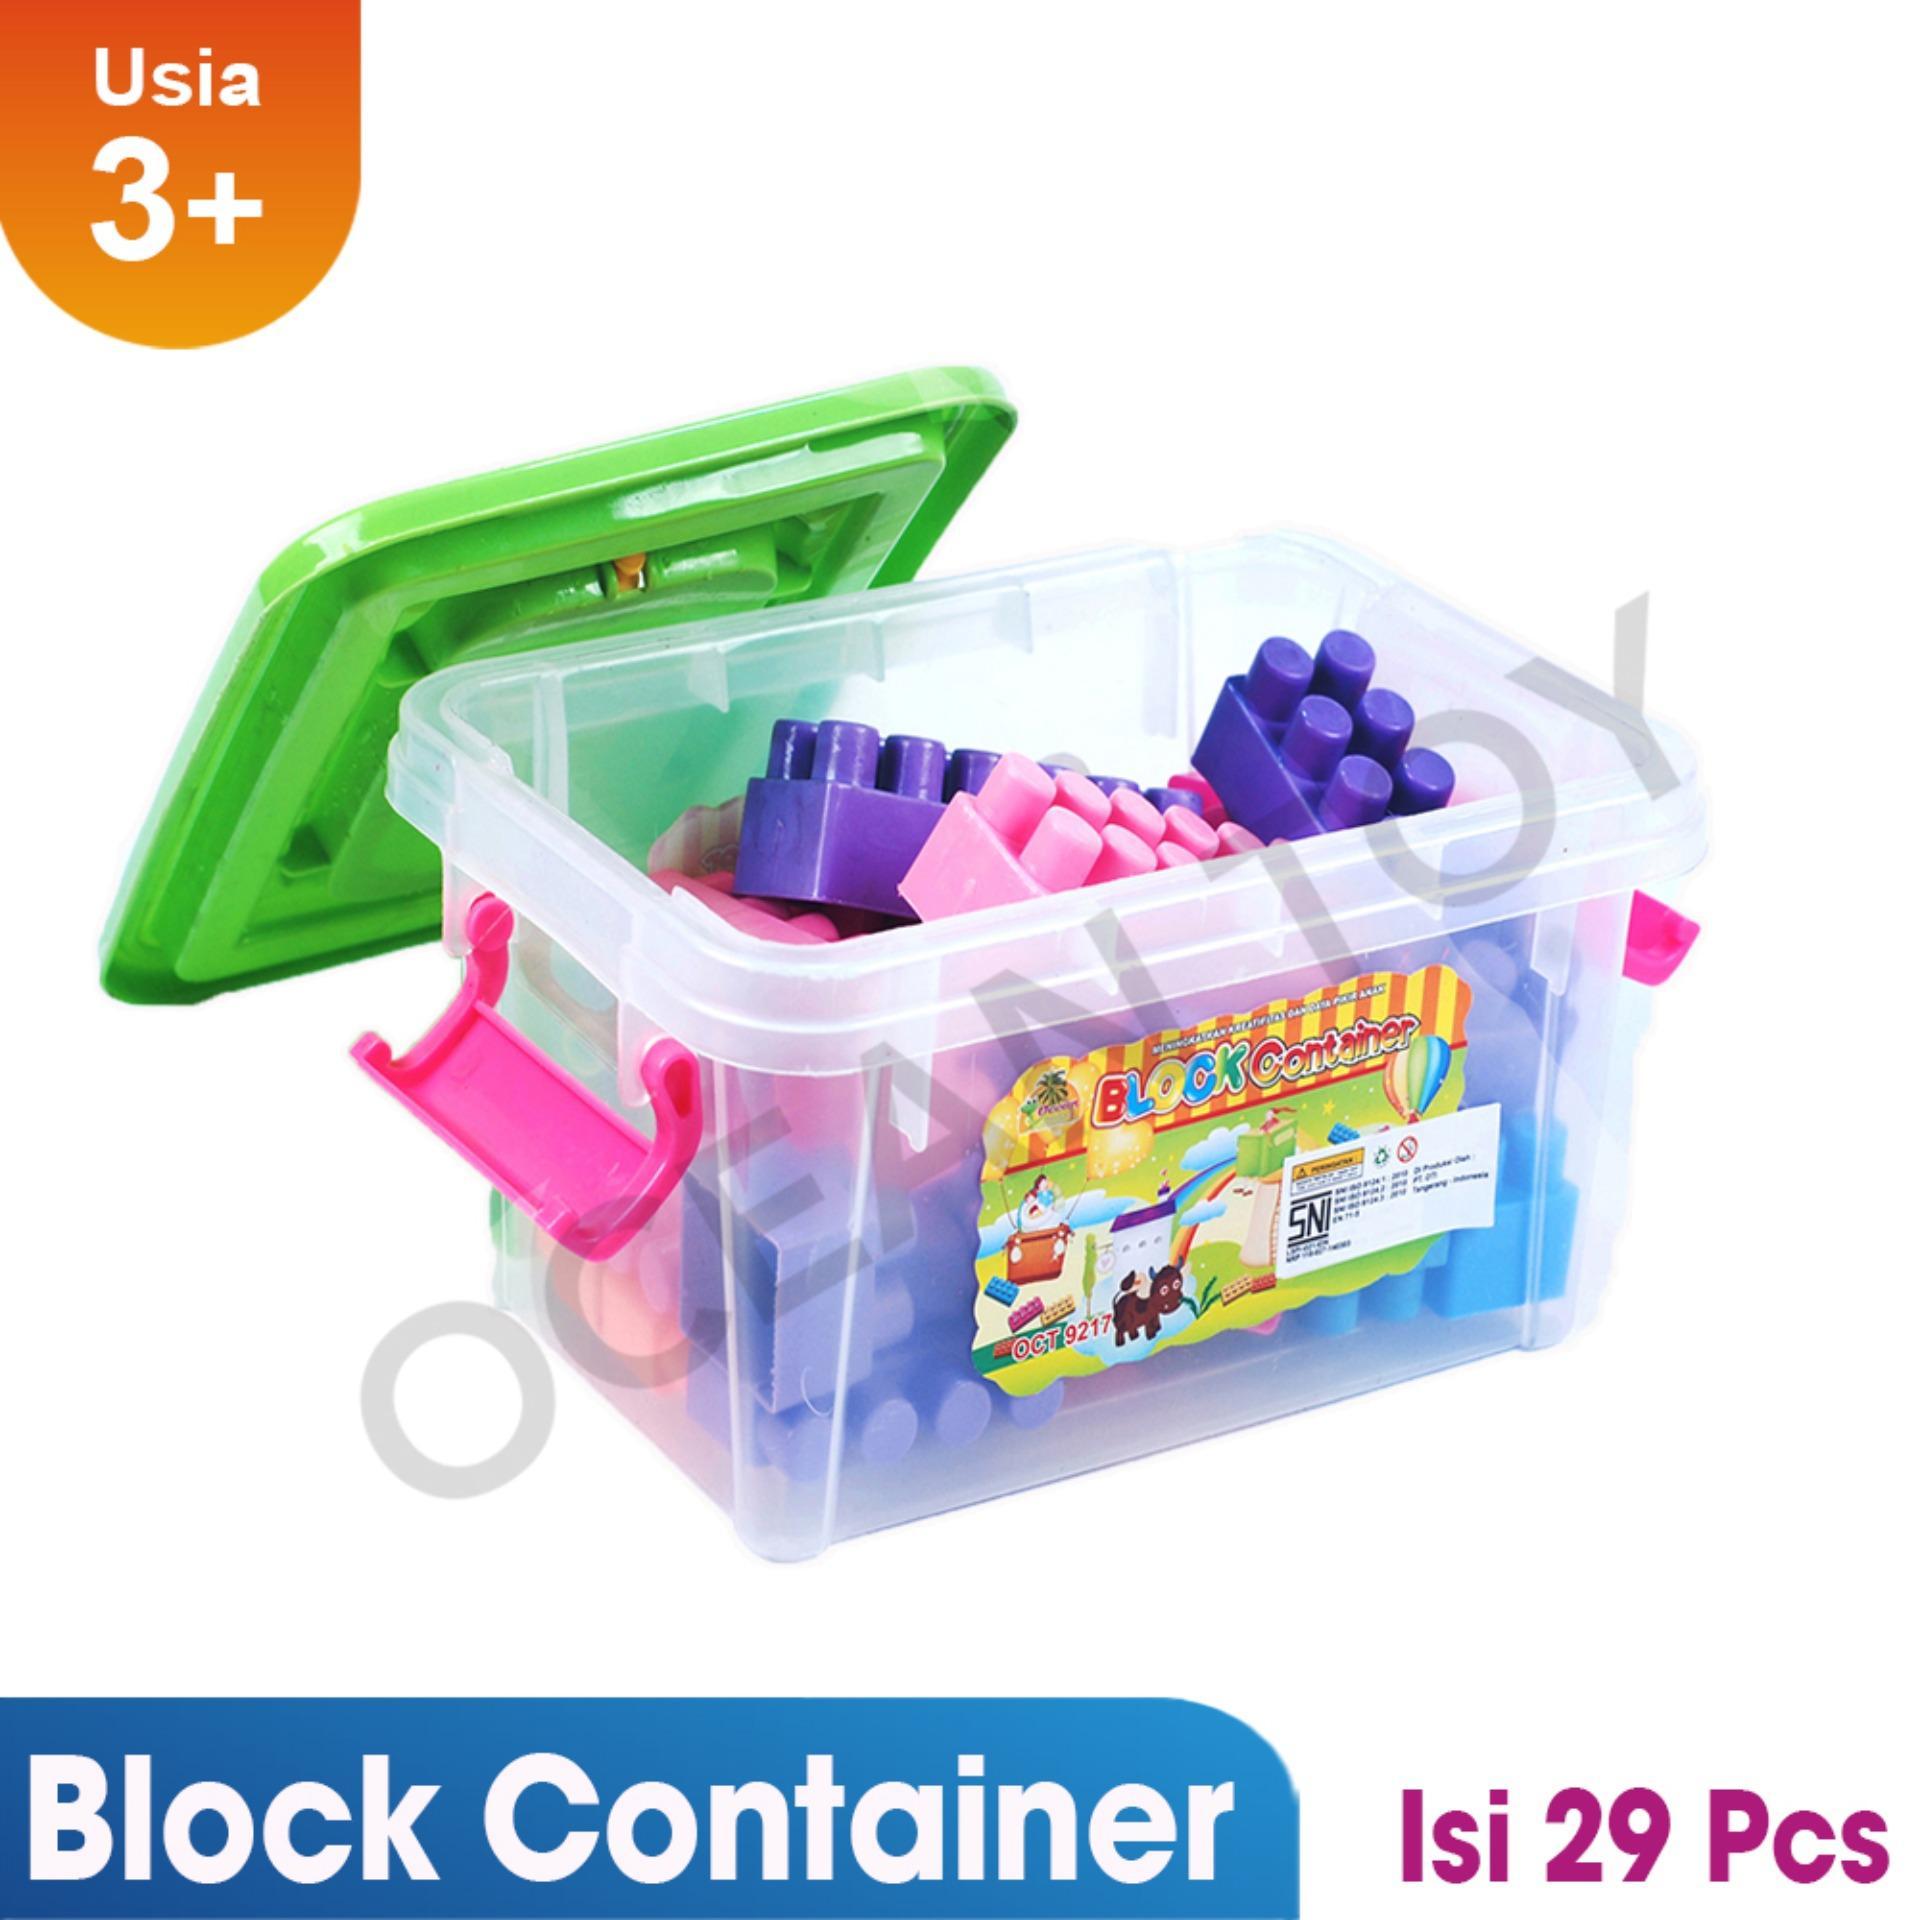 Block Container Lazada Birthday Special Promo Murah